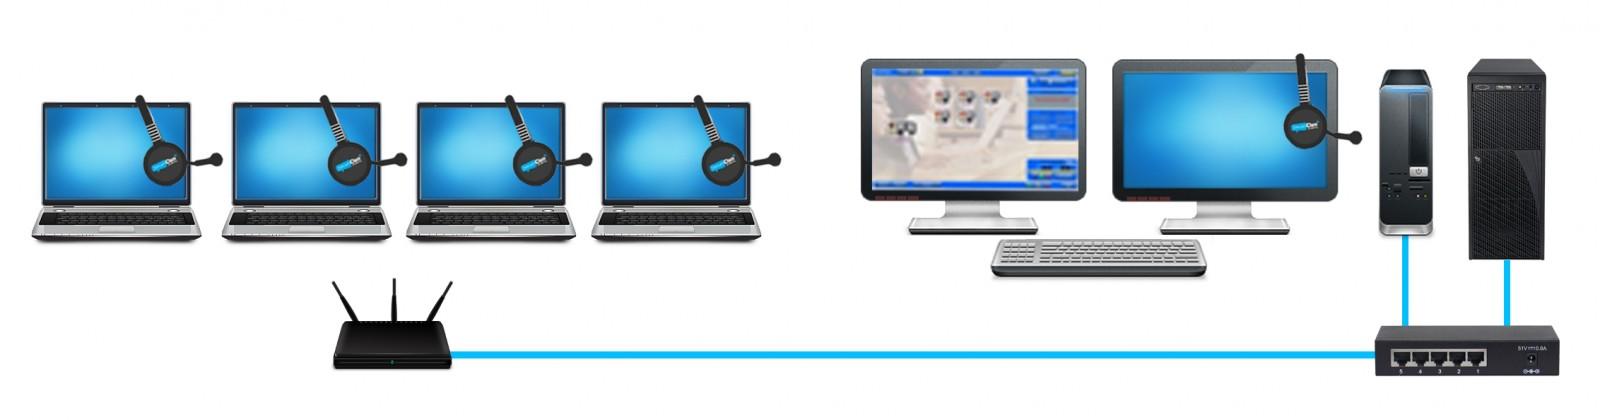 WLAN-%E2%80%93-Wireless-Local-Area-Netwo